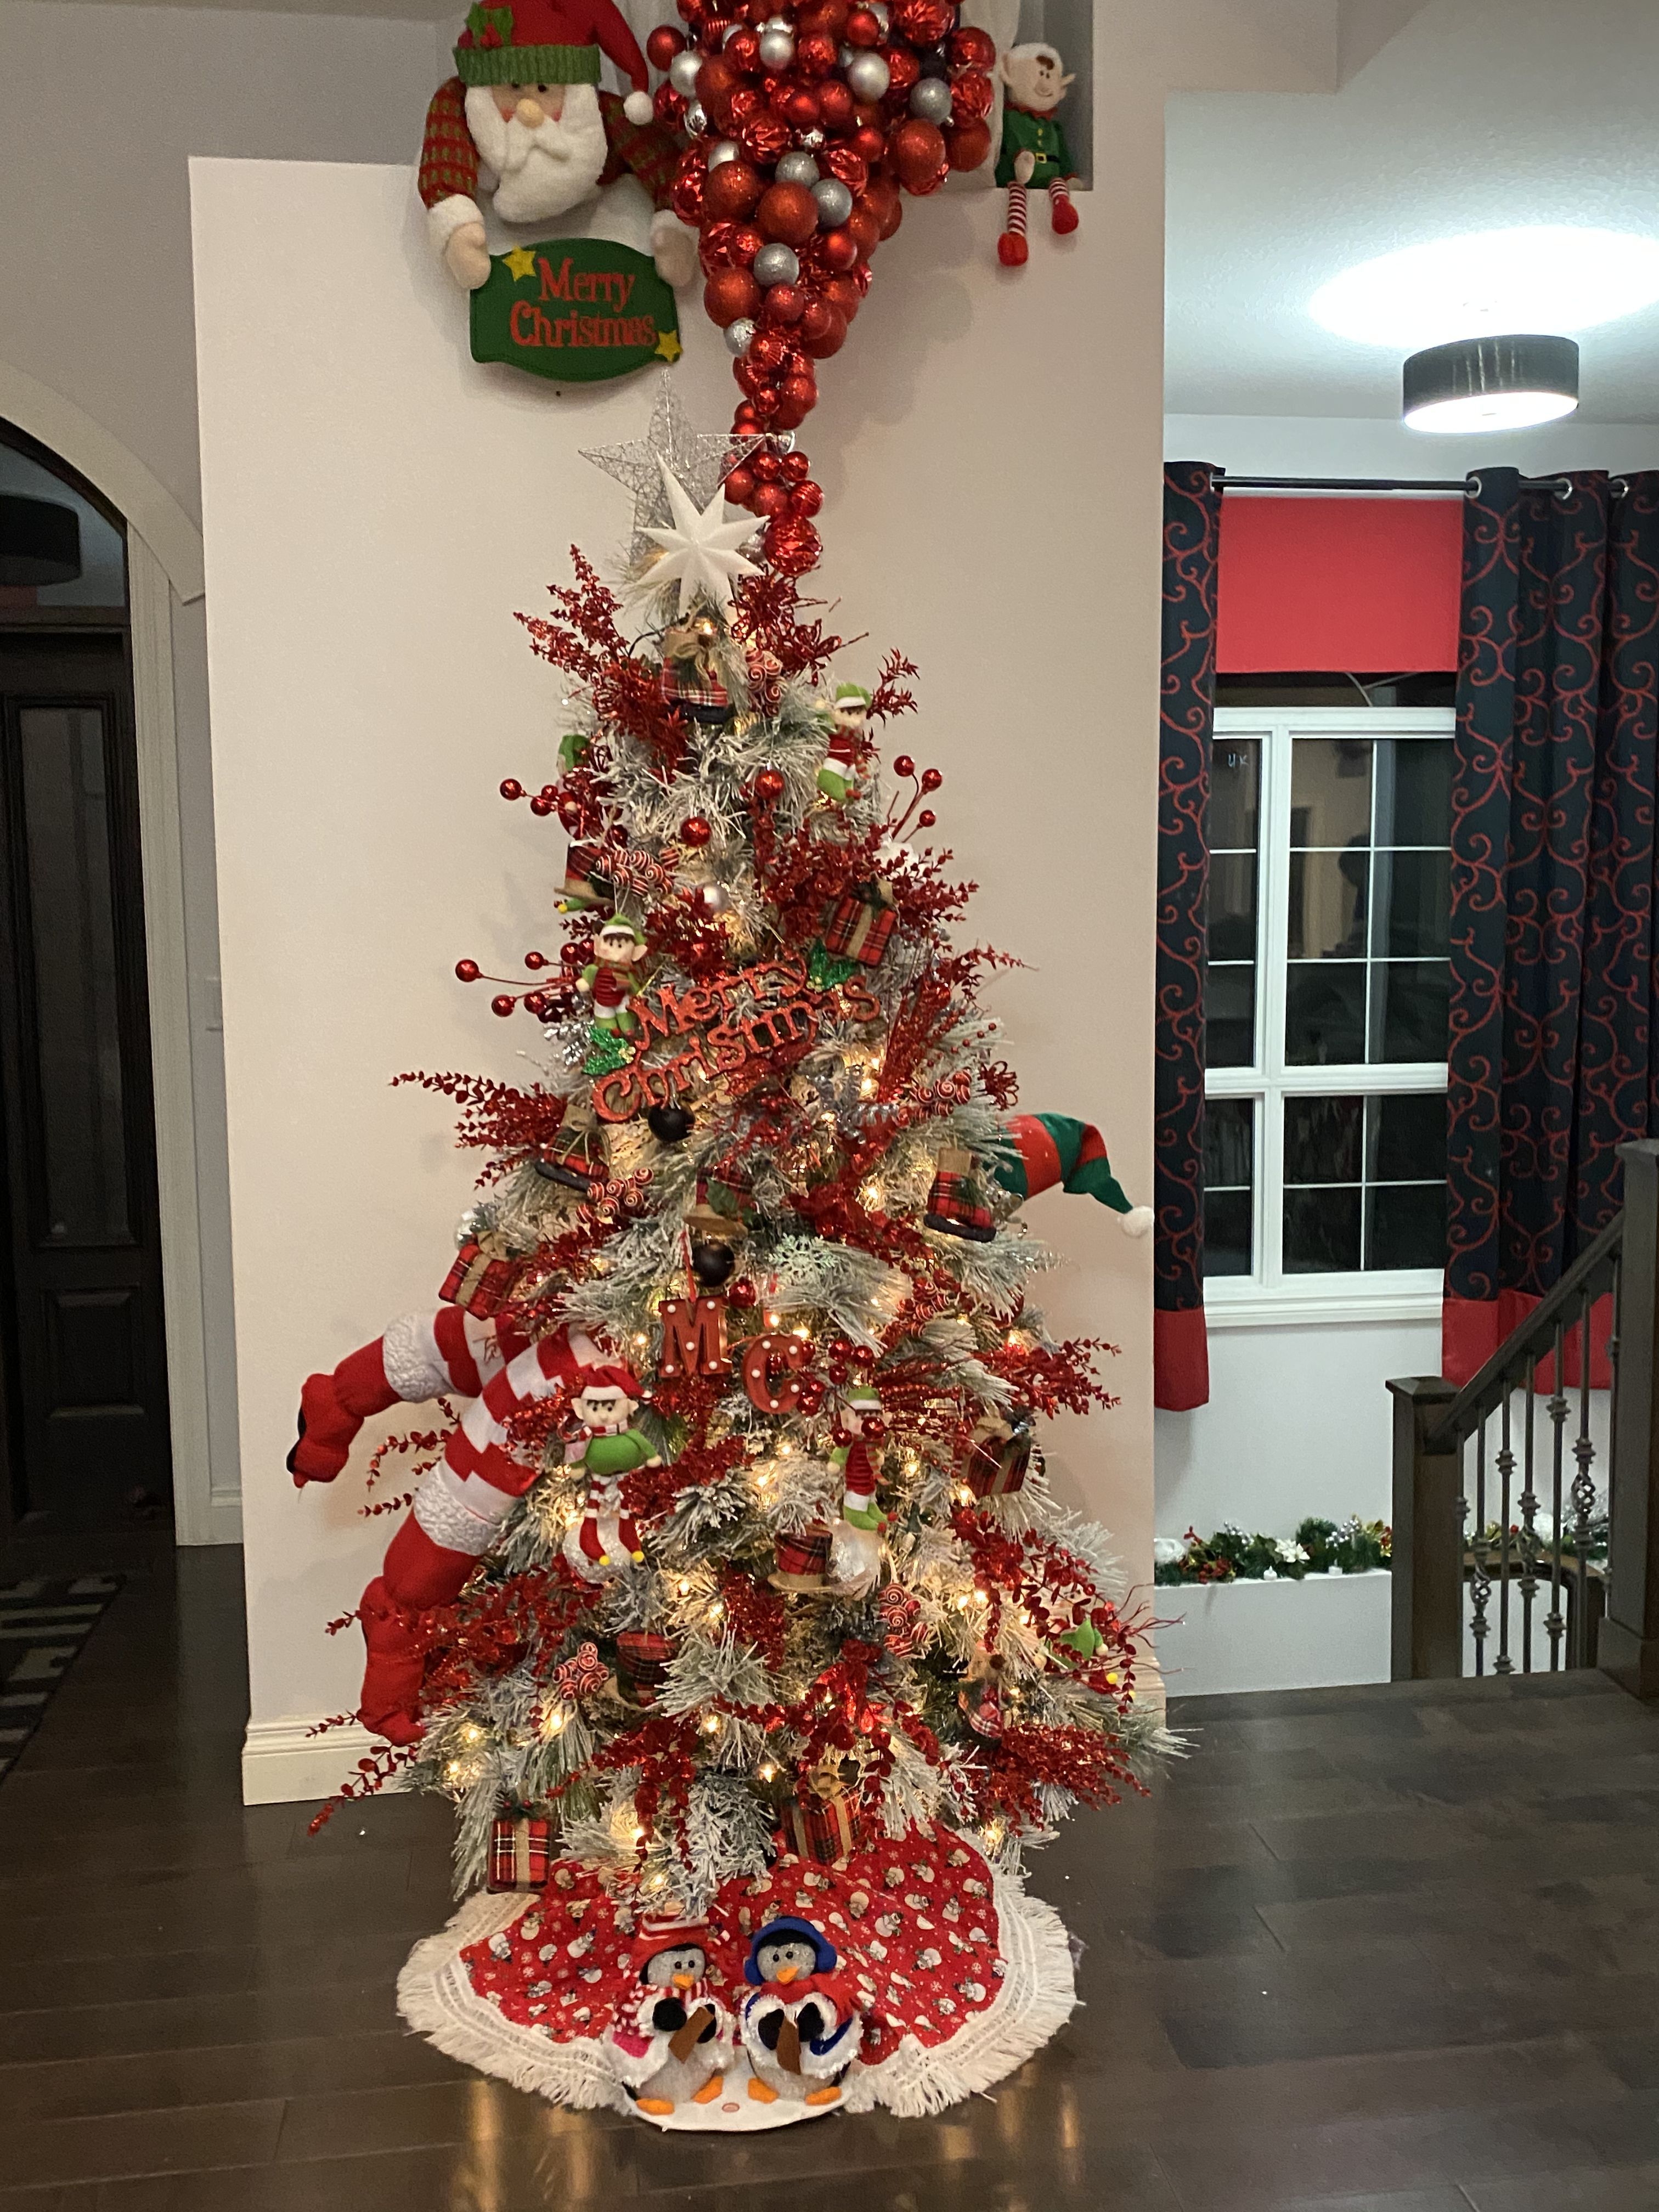 Crazy Christmas Tree Christmas Tree Christmas Tree Decorations Holiday Decor